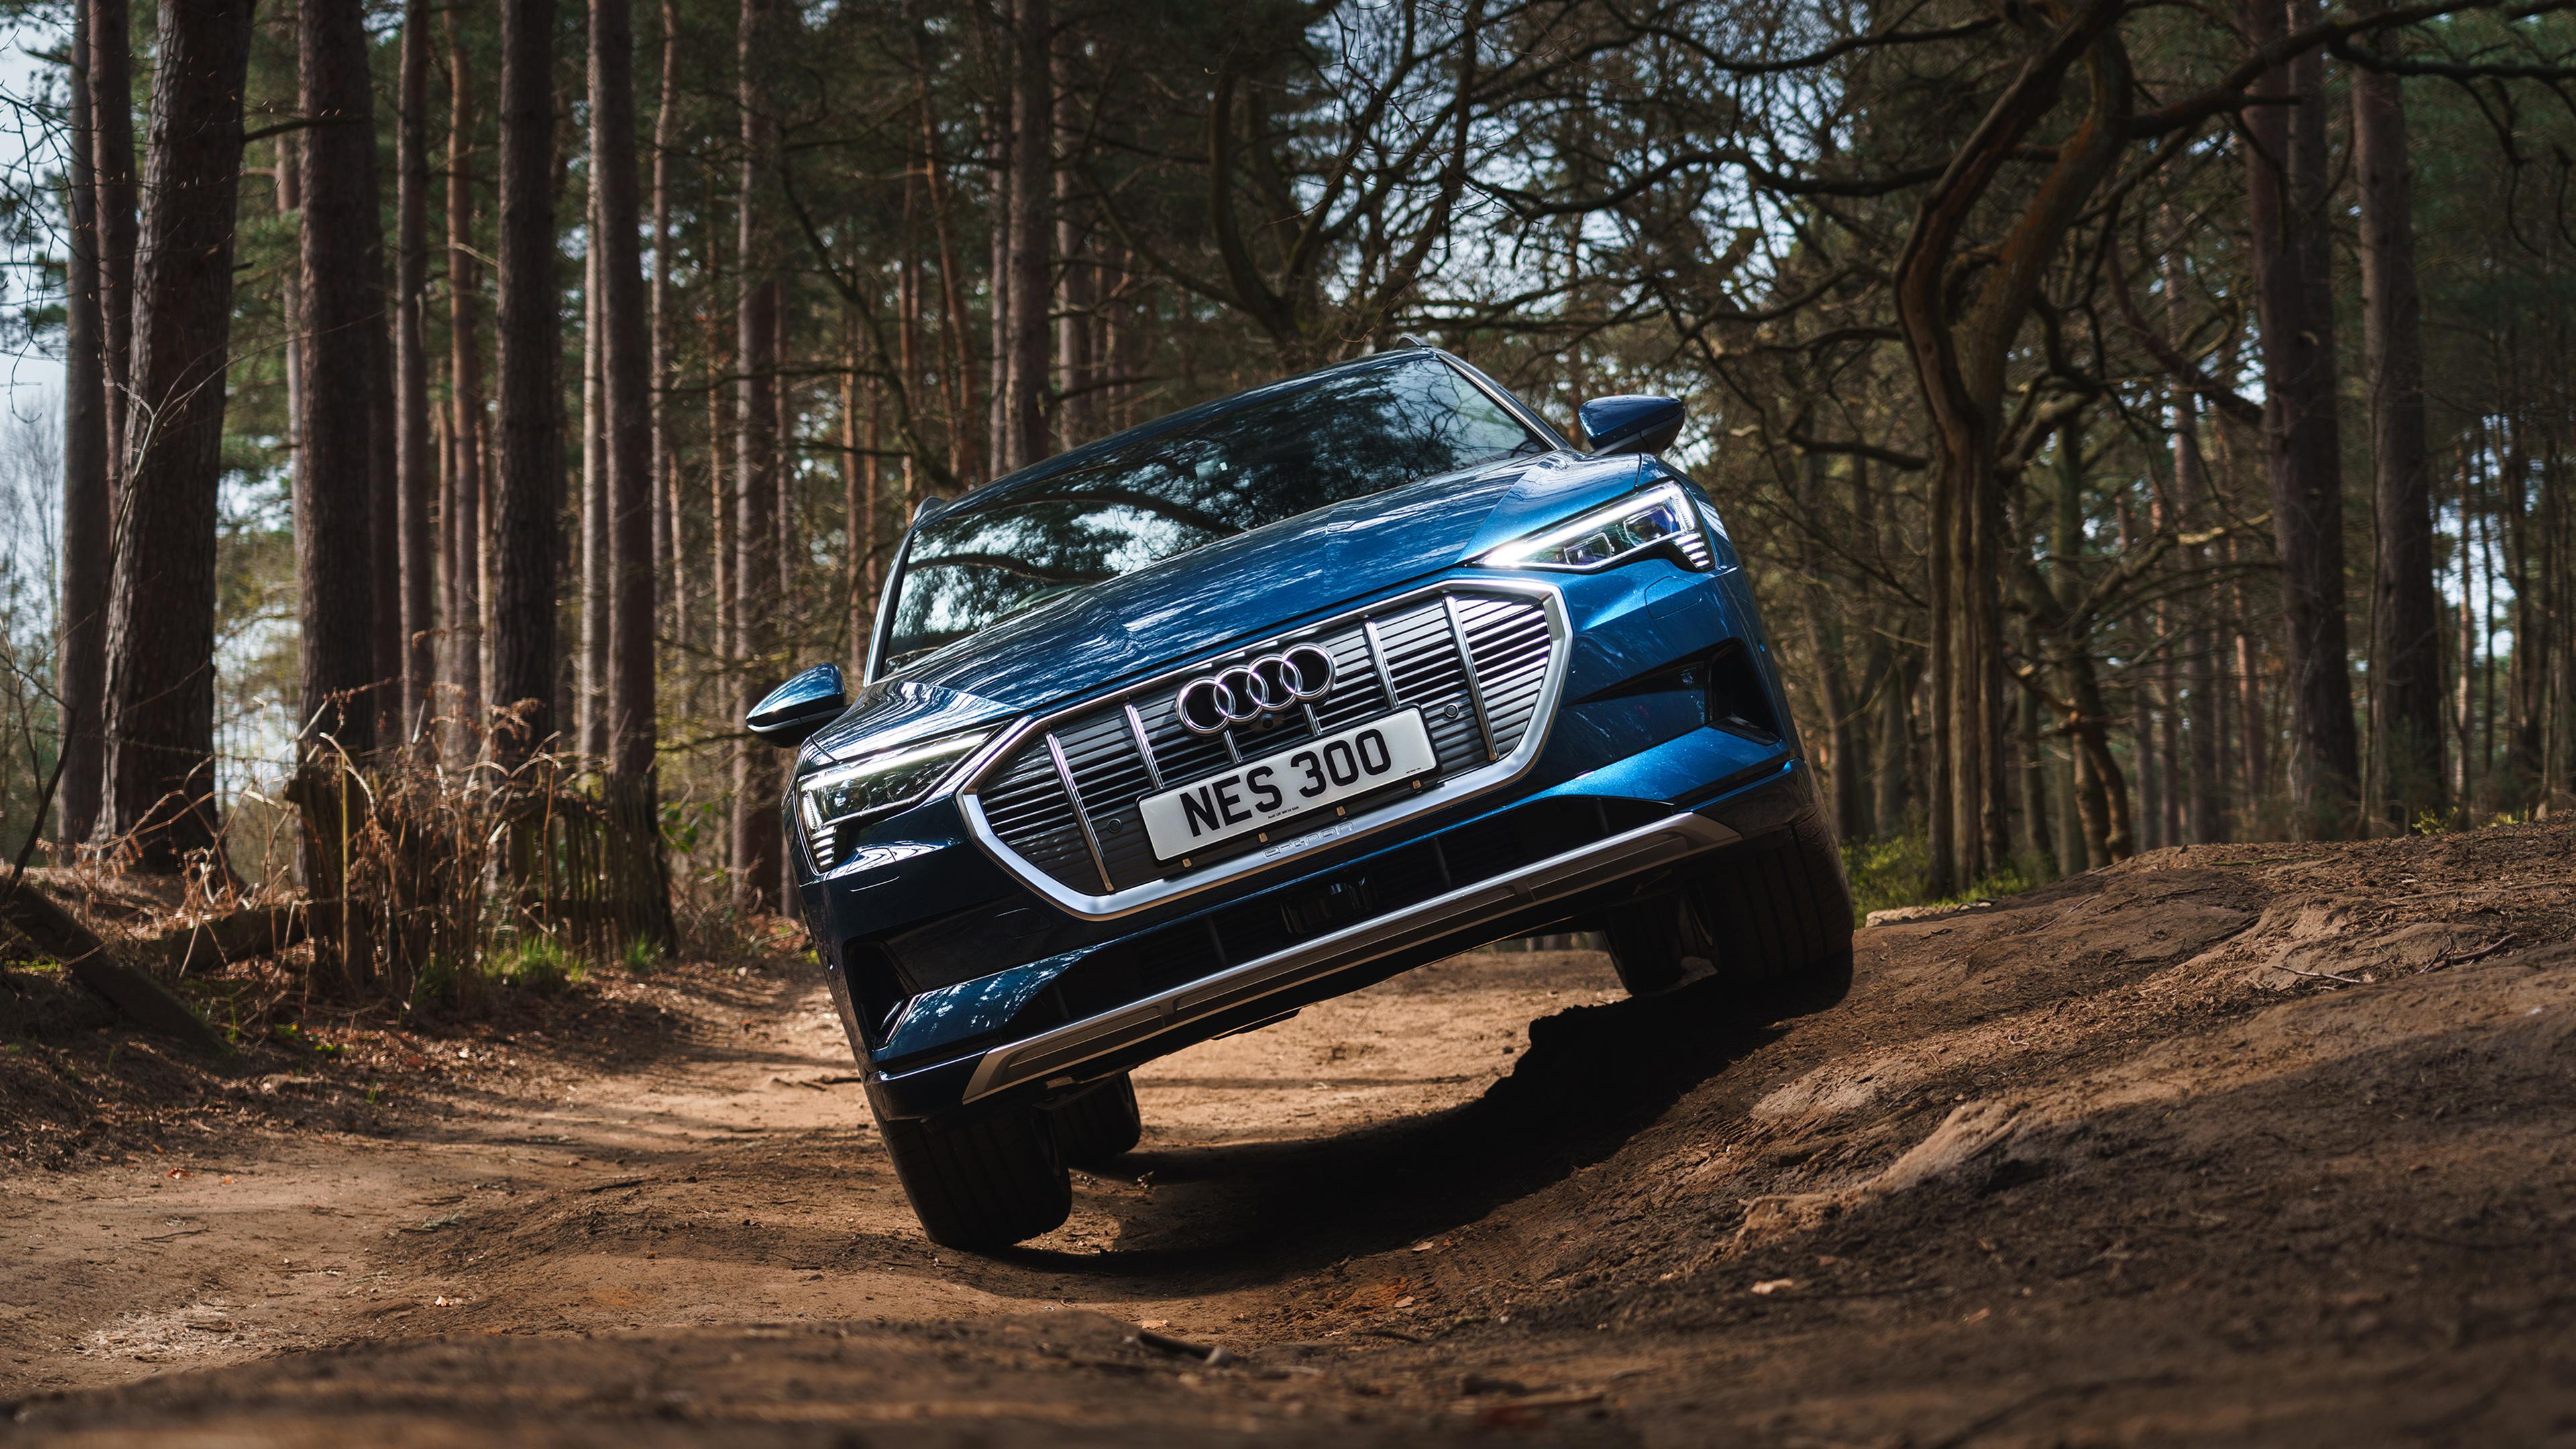 Audi e-tron 55 quattro 2019 4K 3 Wallpaper   HD Car ...